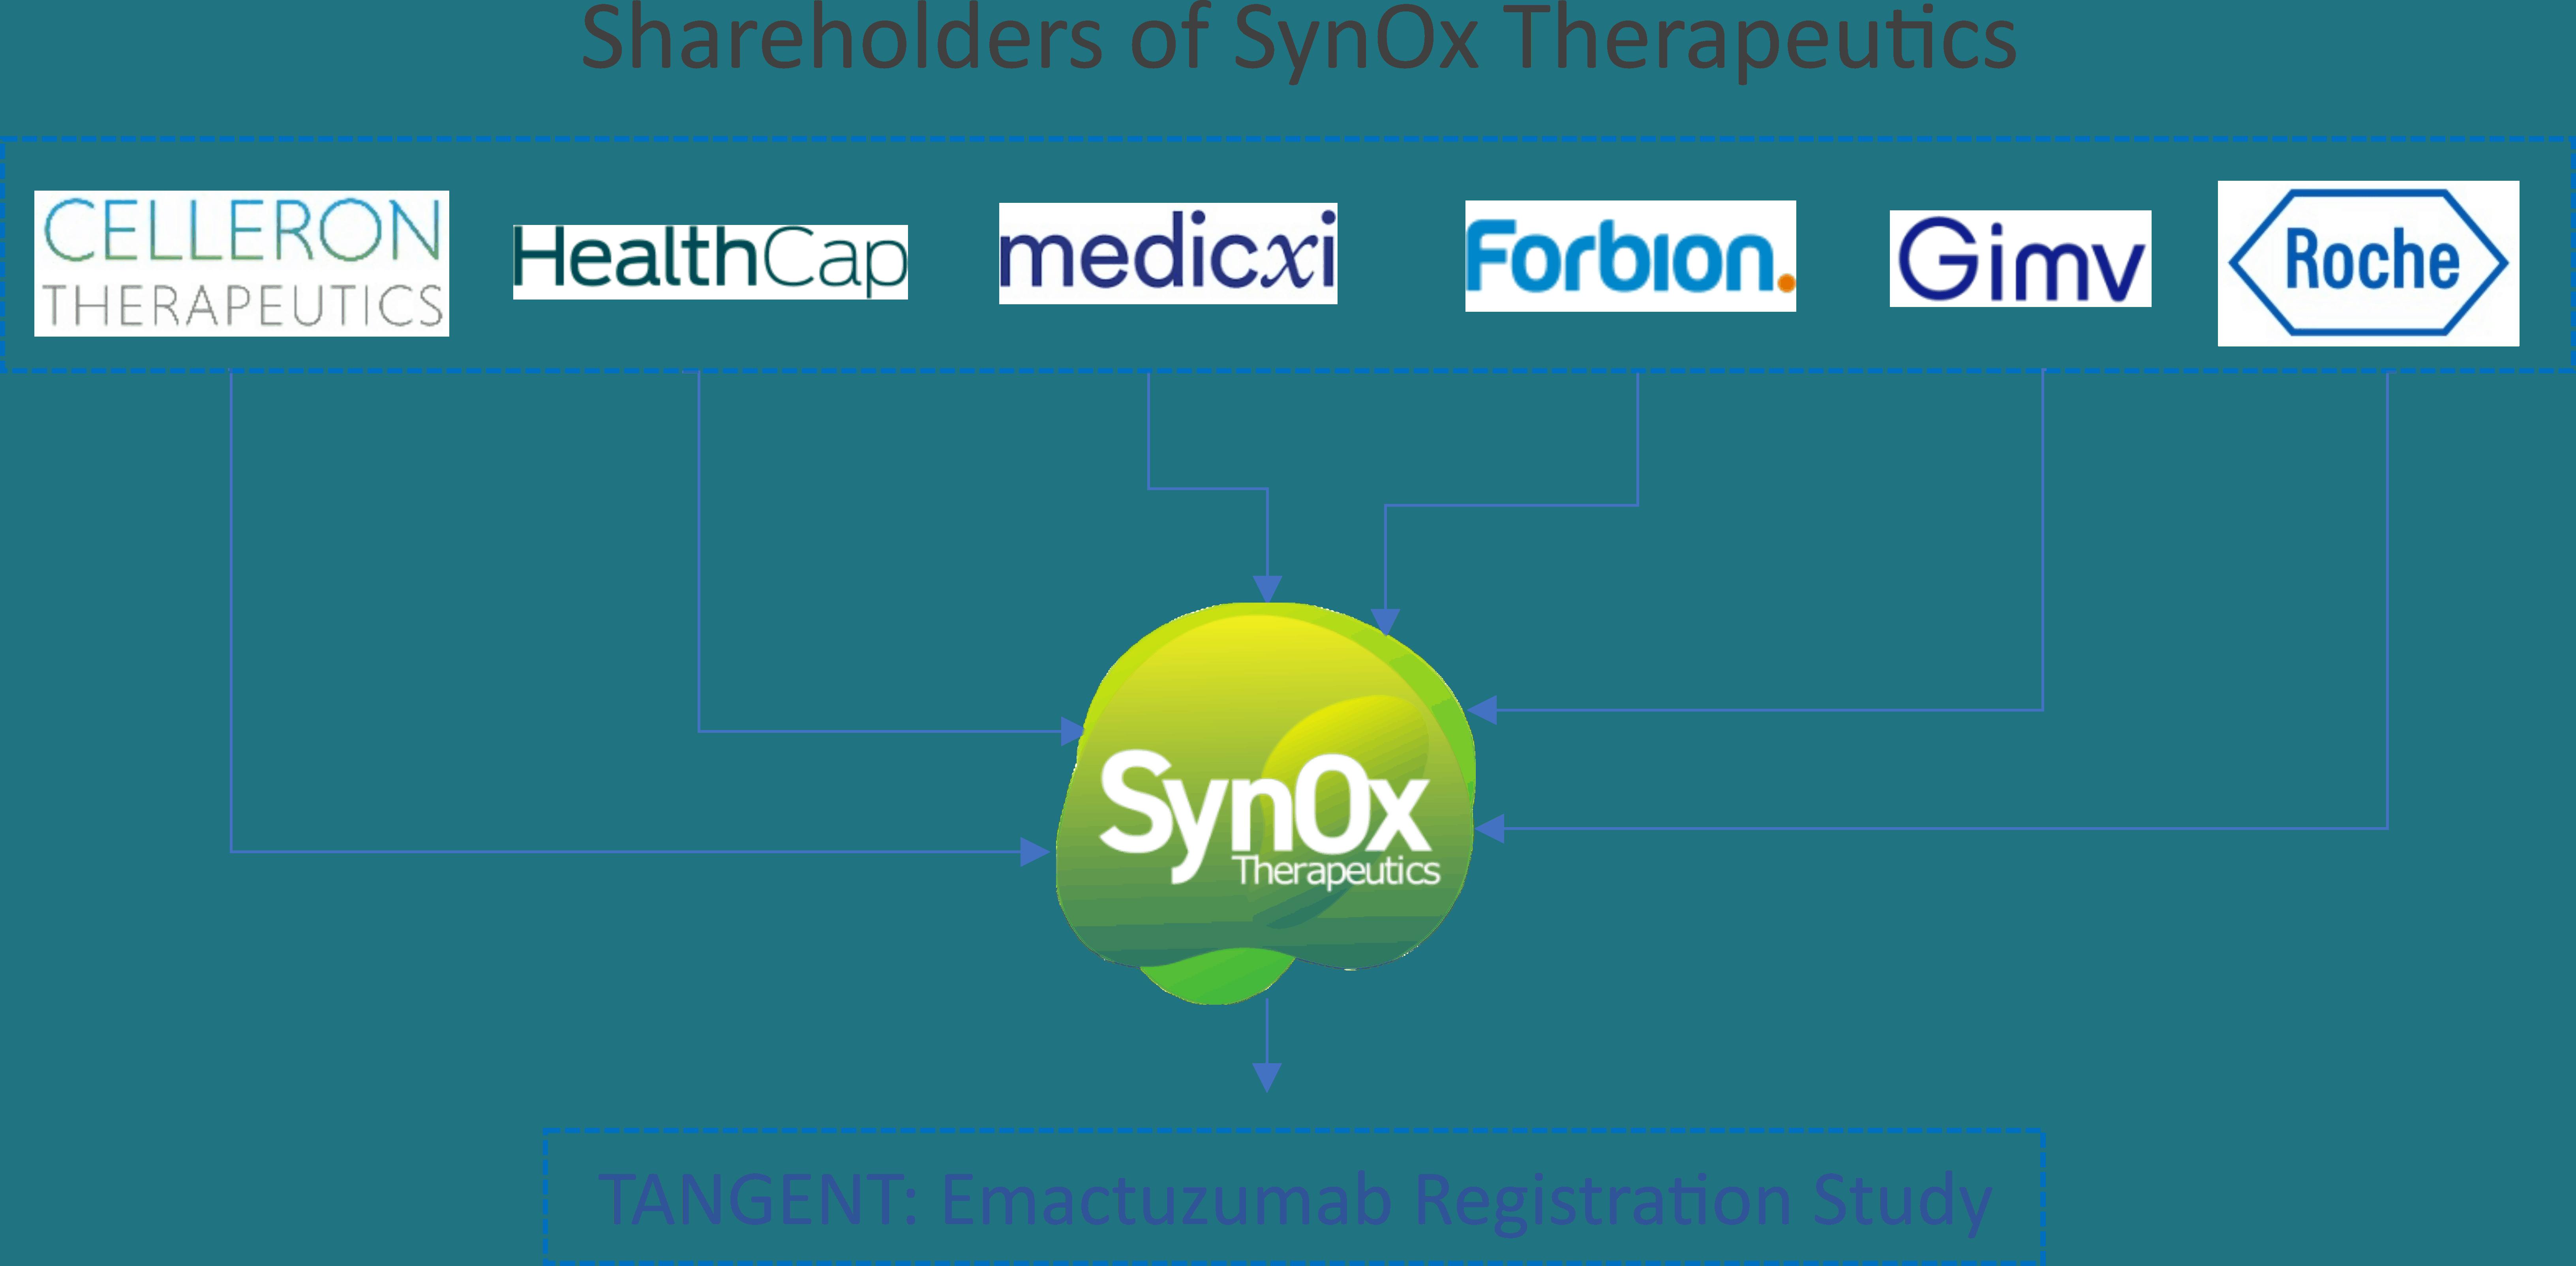 2. SynOx Shareholders